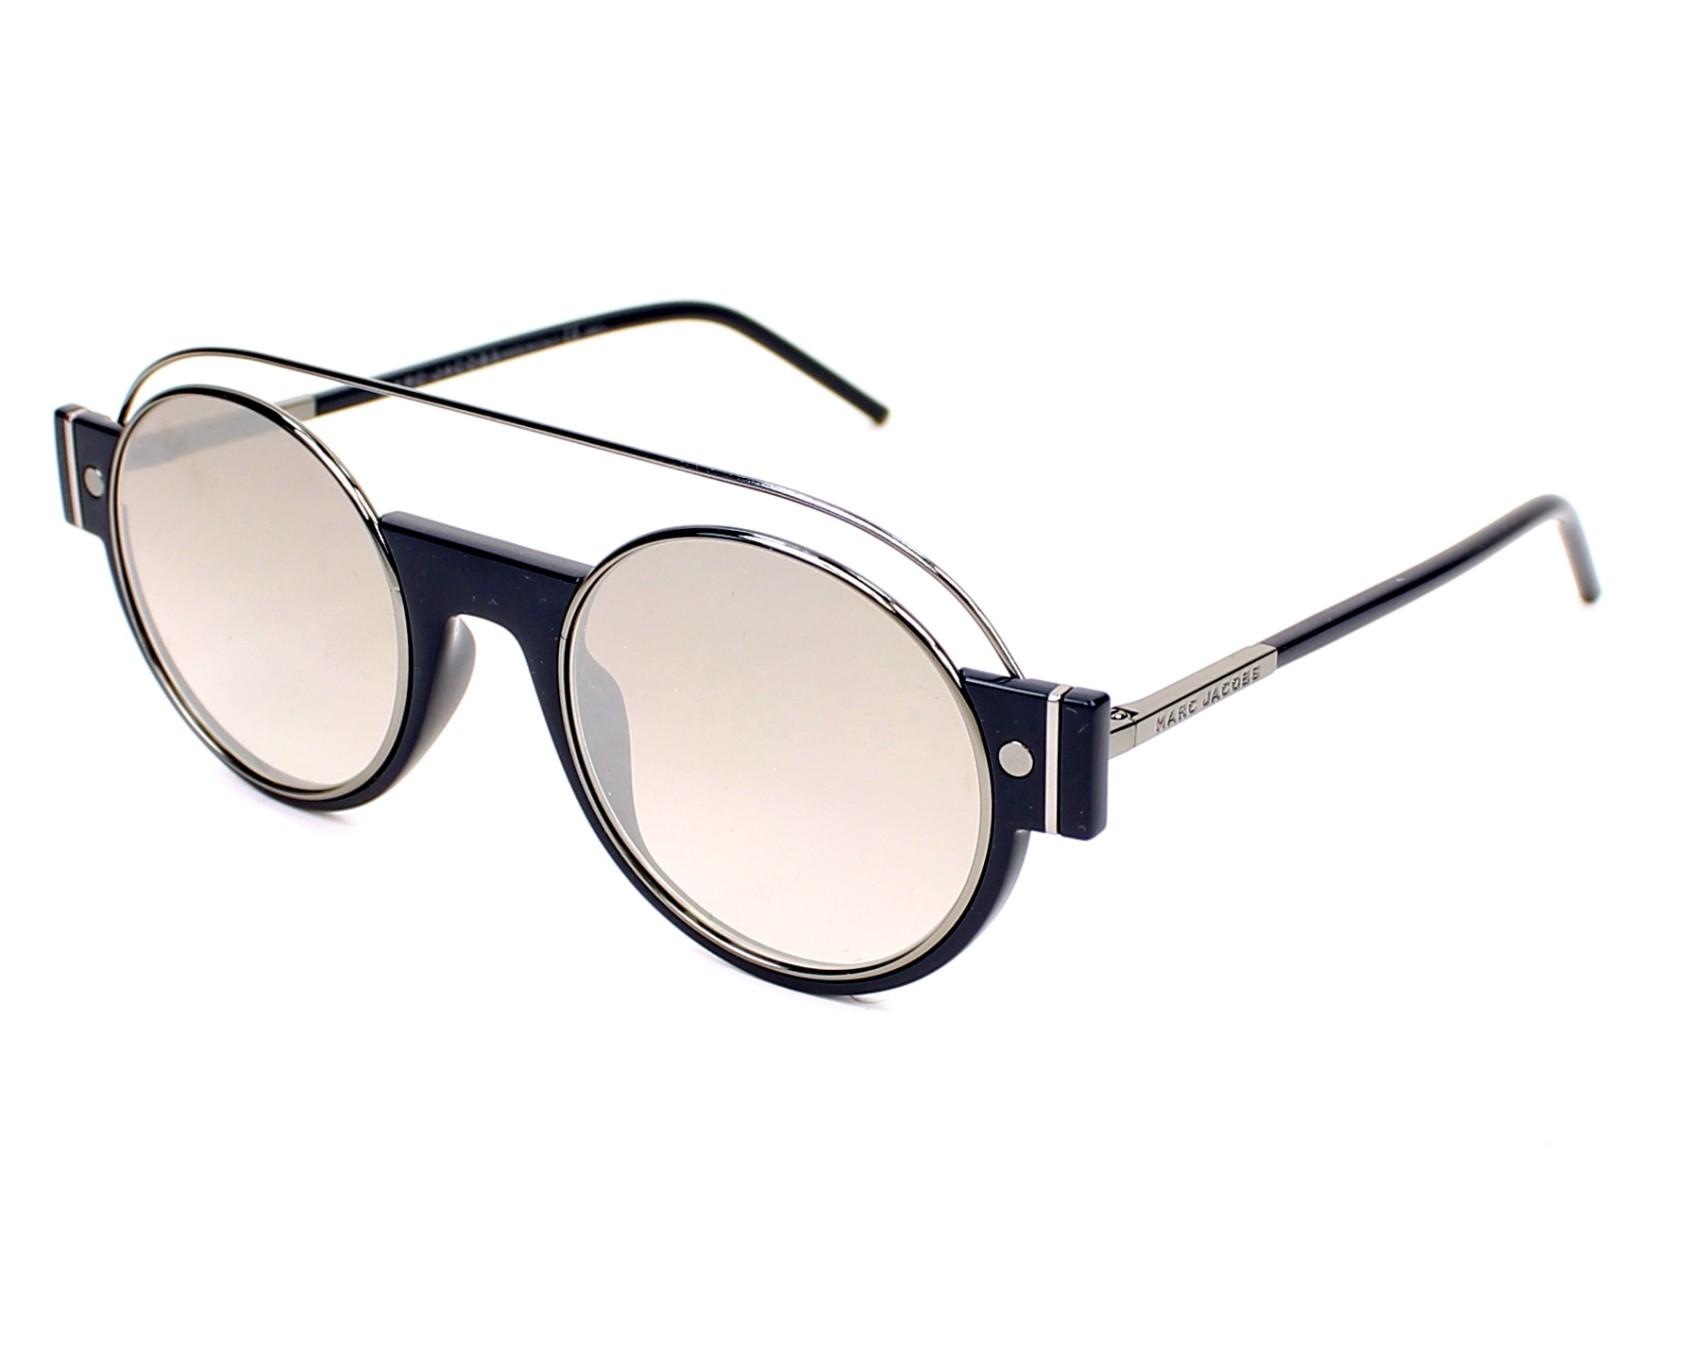 Sunglasses Marc Jacobs MARC-2-S U5Z NQ - Blue Silver profile view cf4a4b18b5a